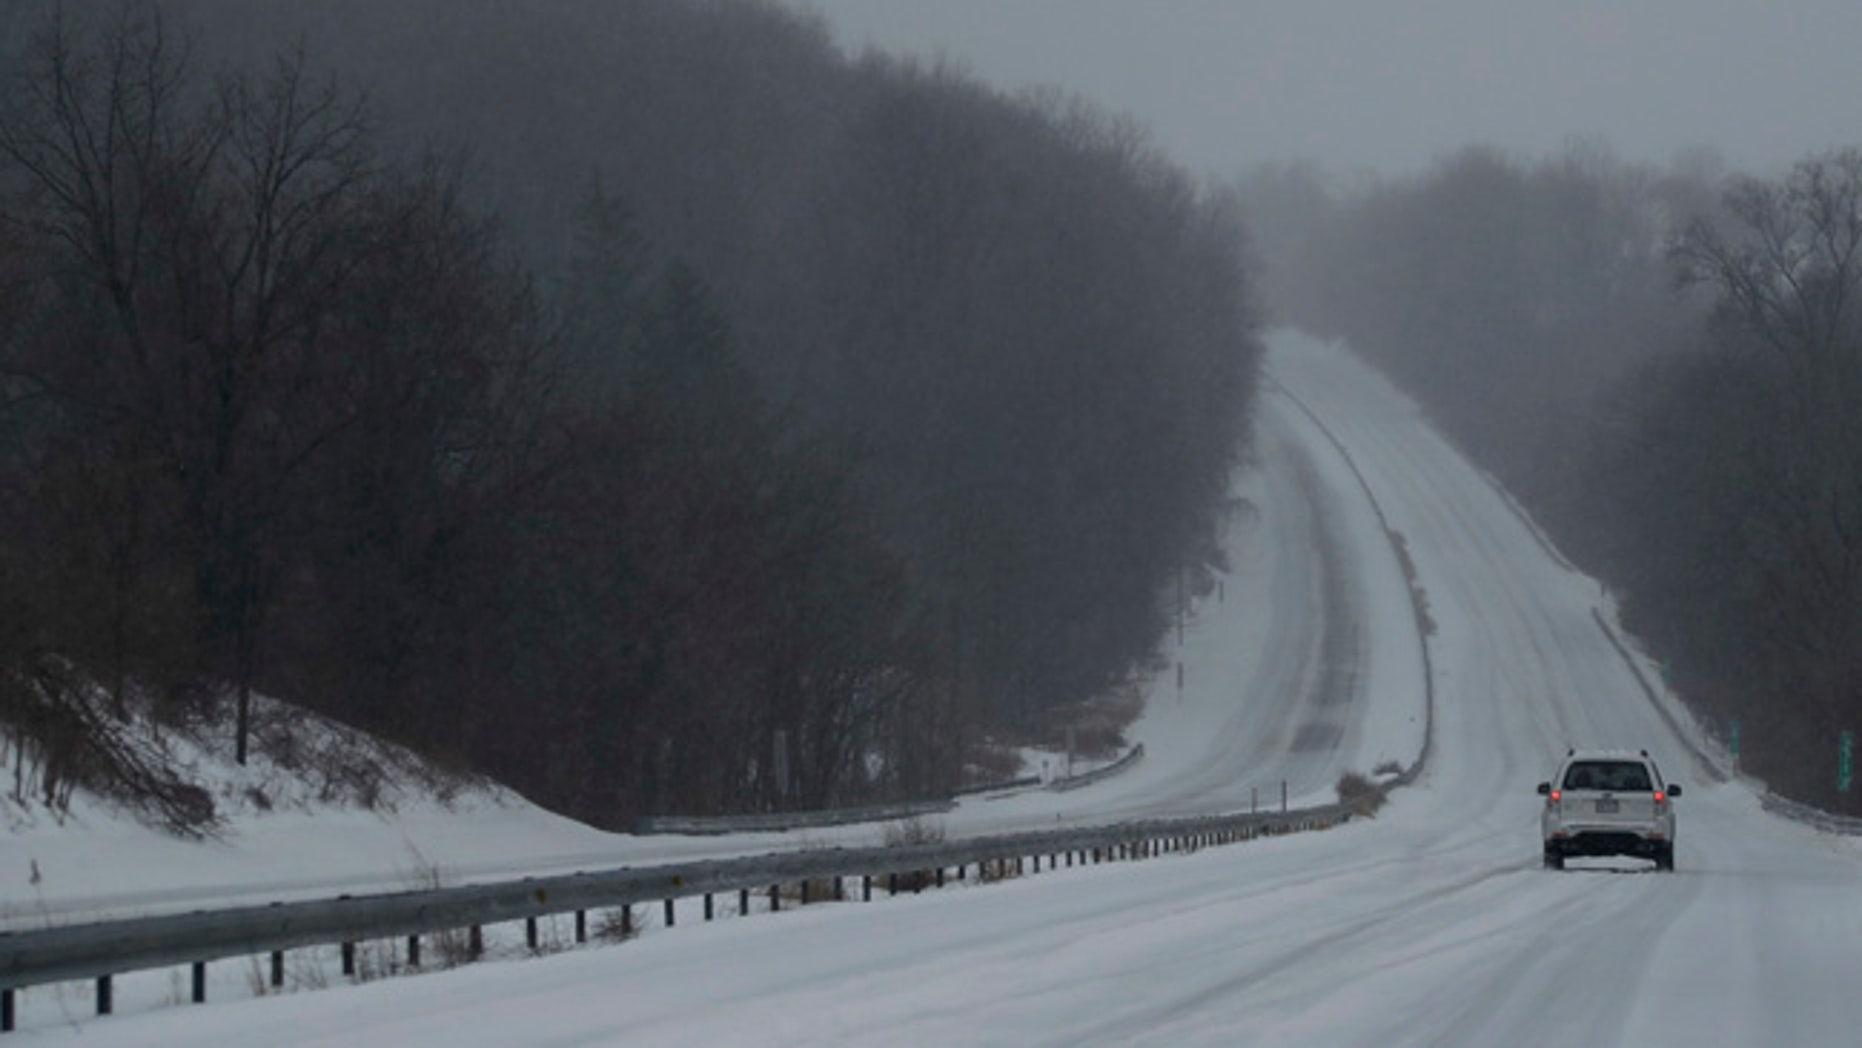 A car drives down US 30 through a winter snow storm, Tuesday, March 14, 2017, in Valley Township, Pa. (AP Photo/Matt Slocum)